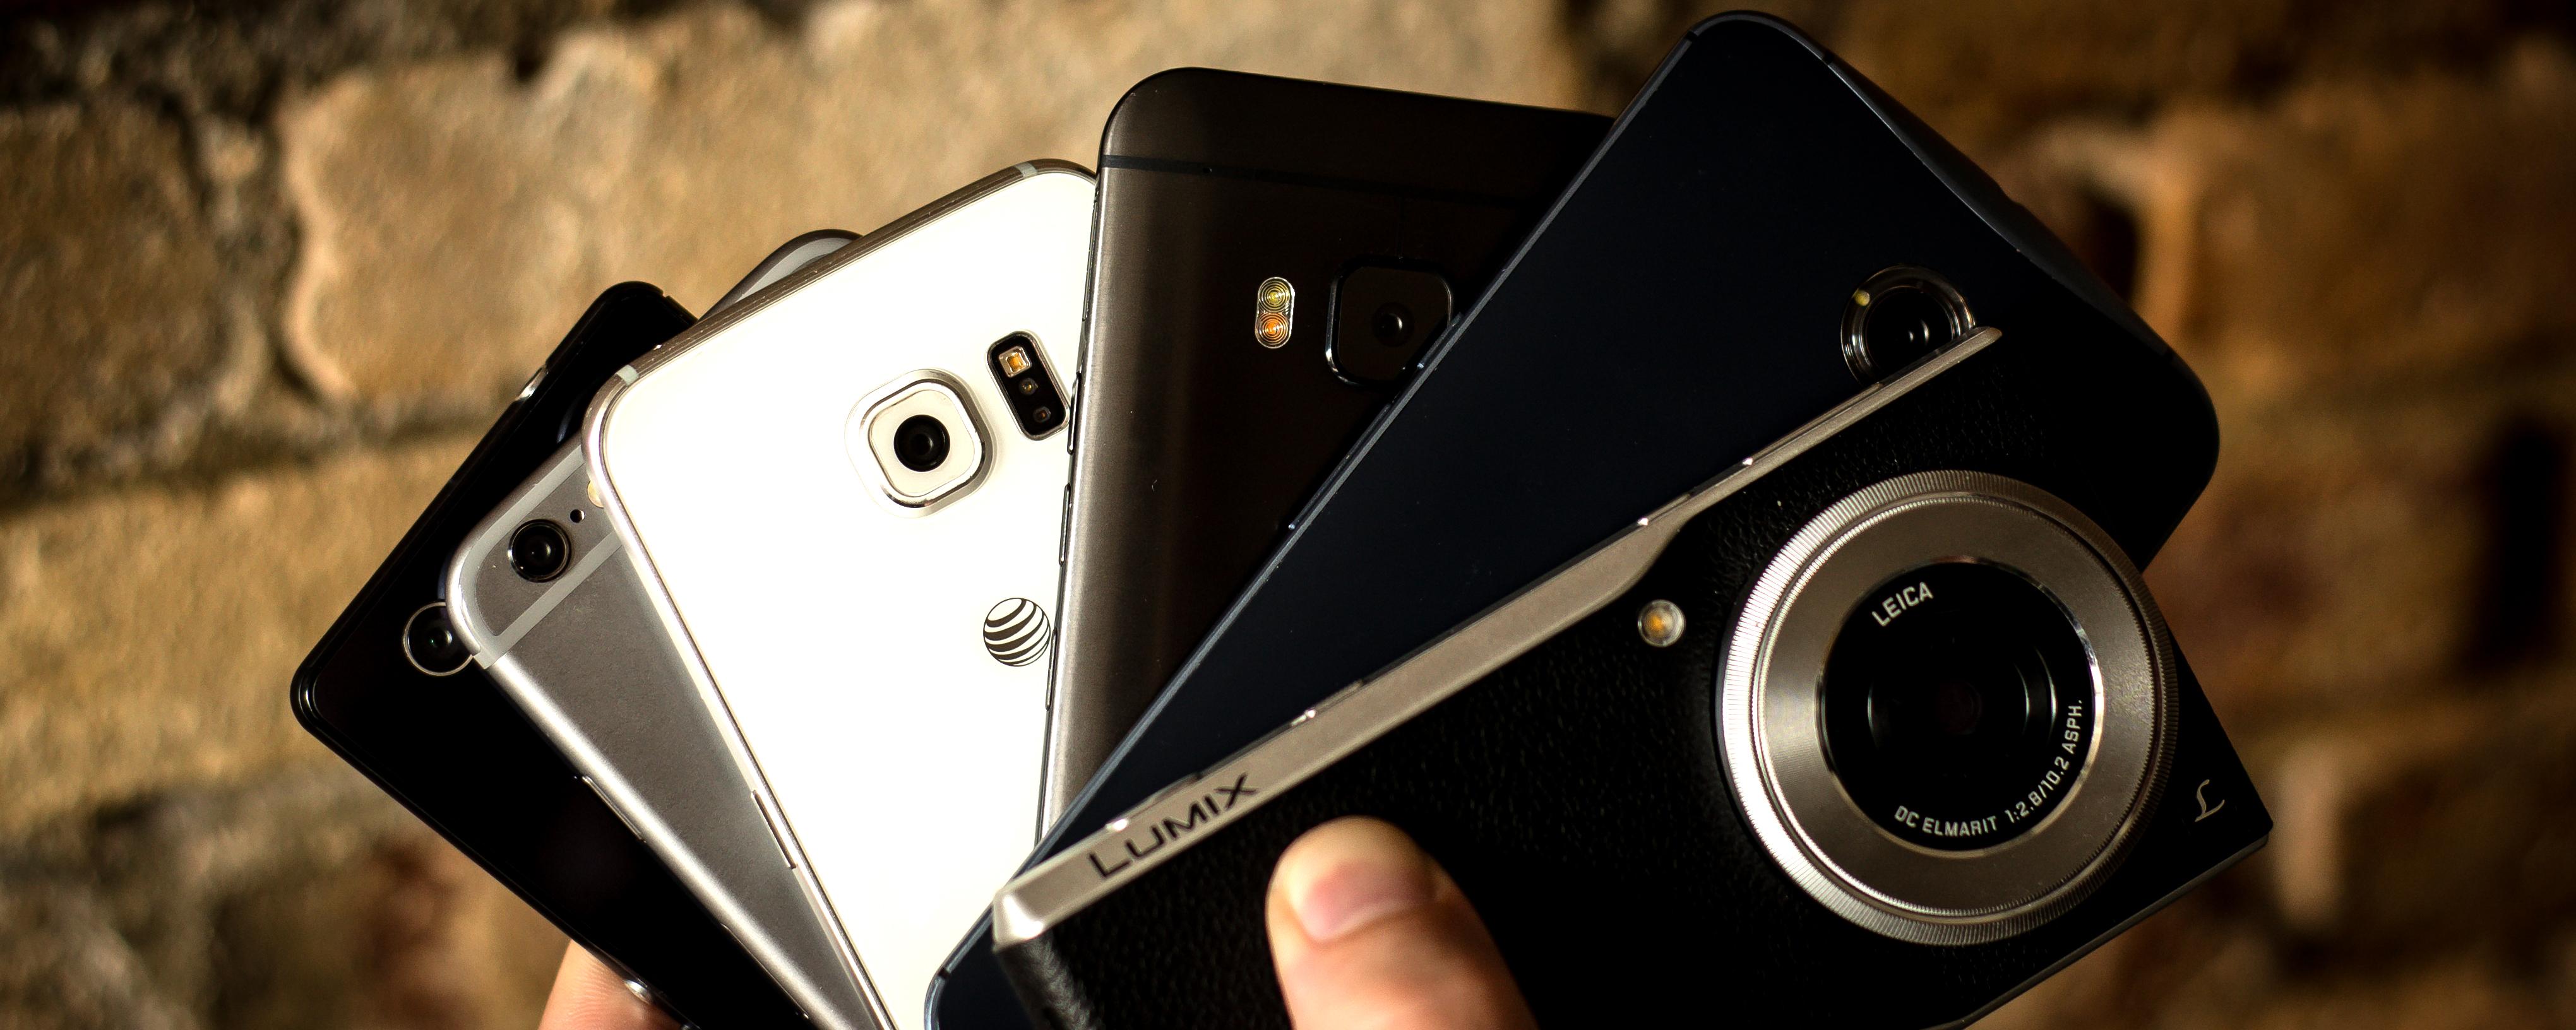 camera-phone-voyeurism